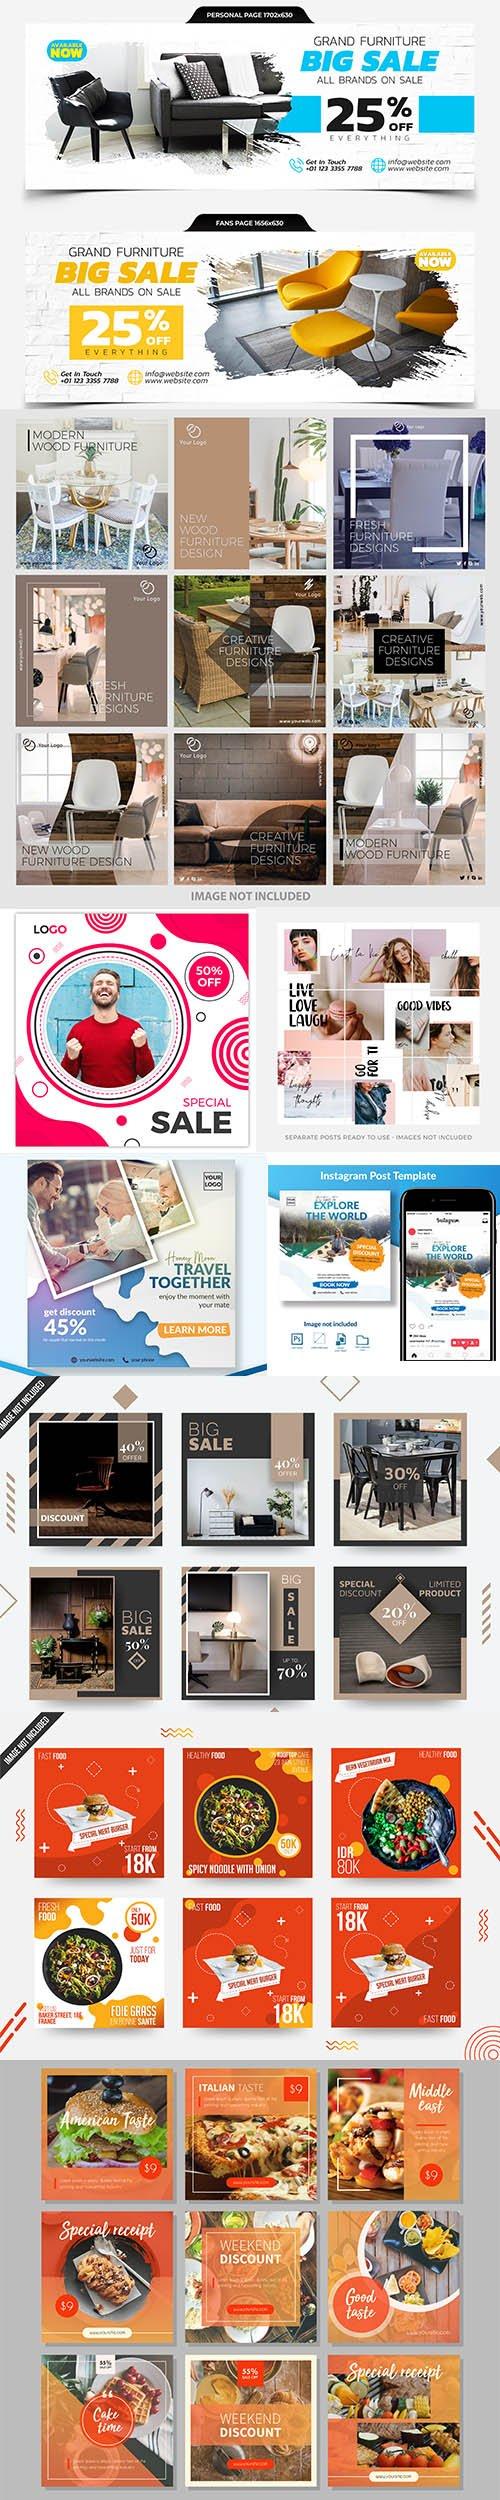 Elegant Social Media Post Template - Instagram and Facebook Cover